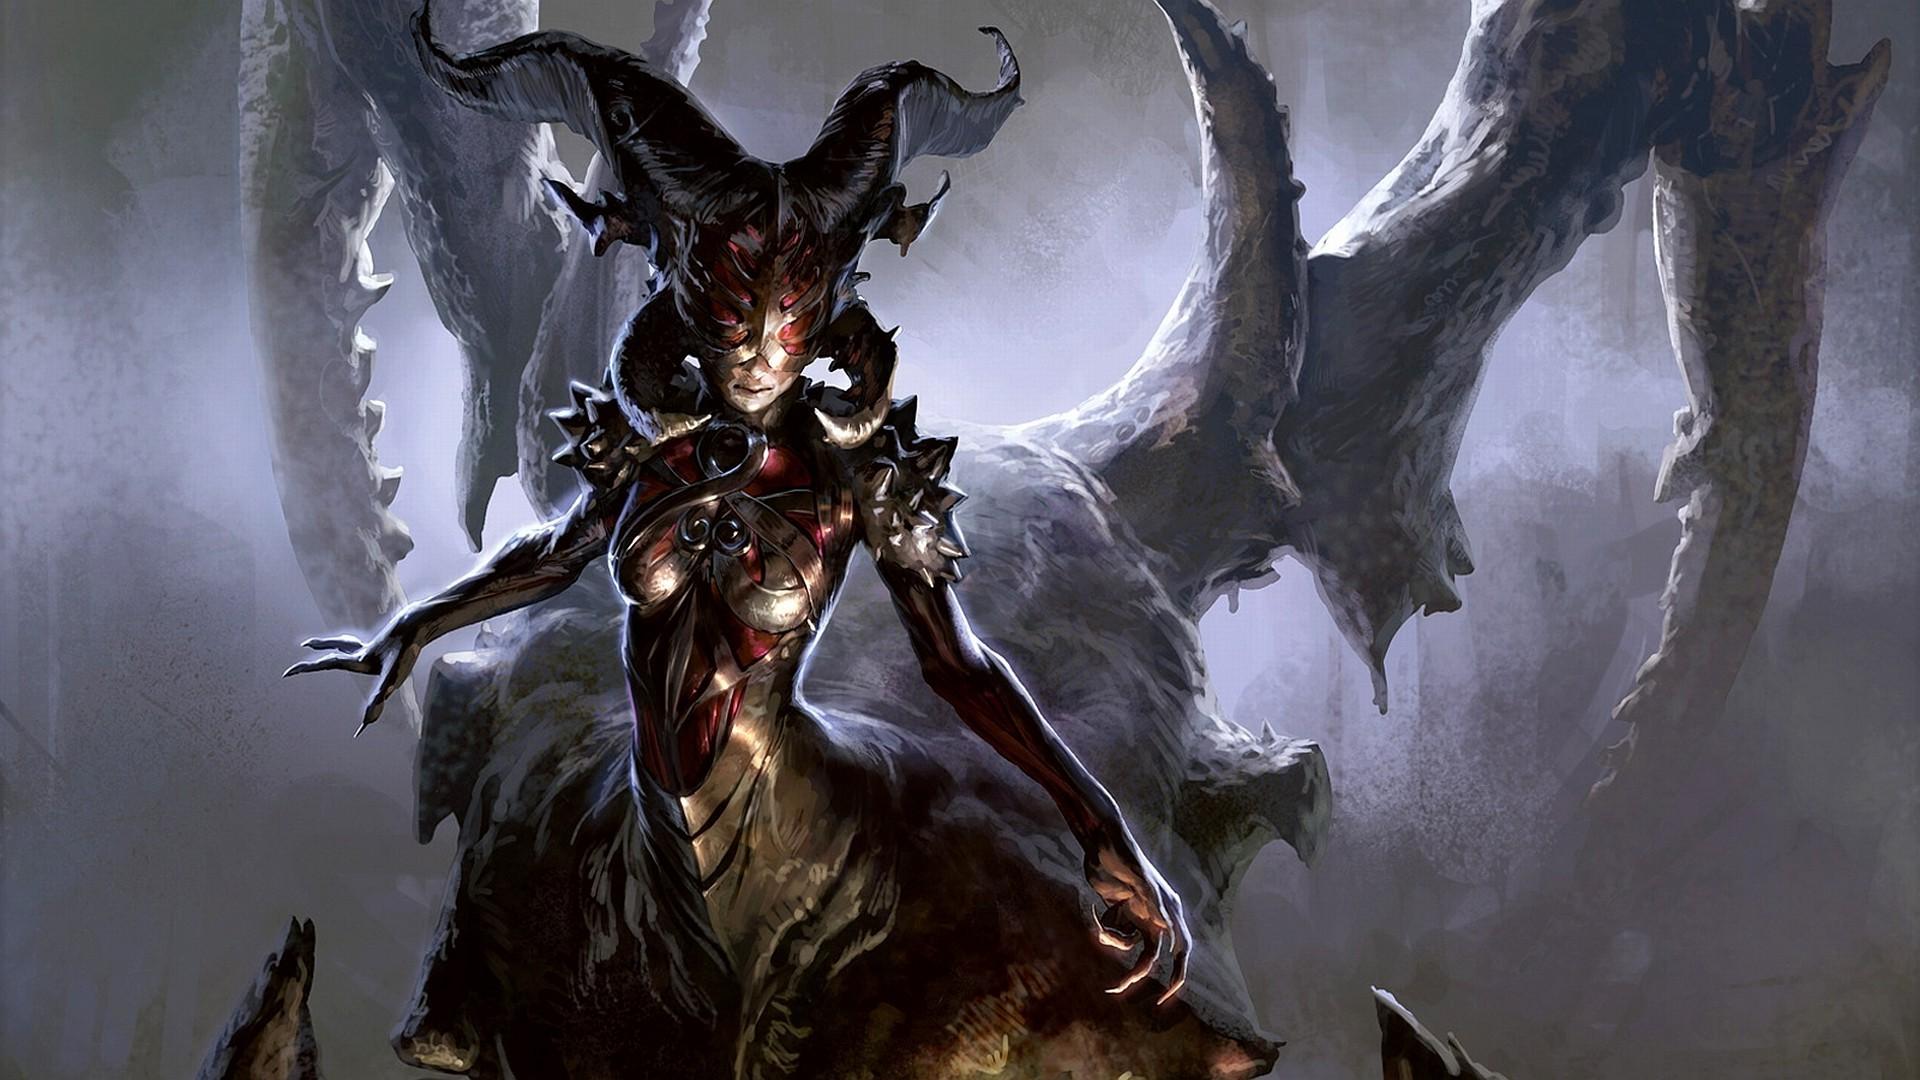 Demon Magic The Gathering Wallpaper 1920x1080px